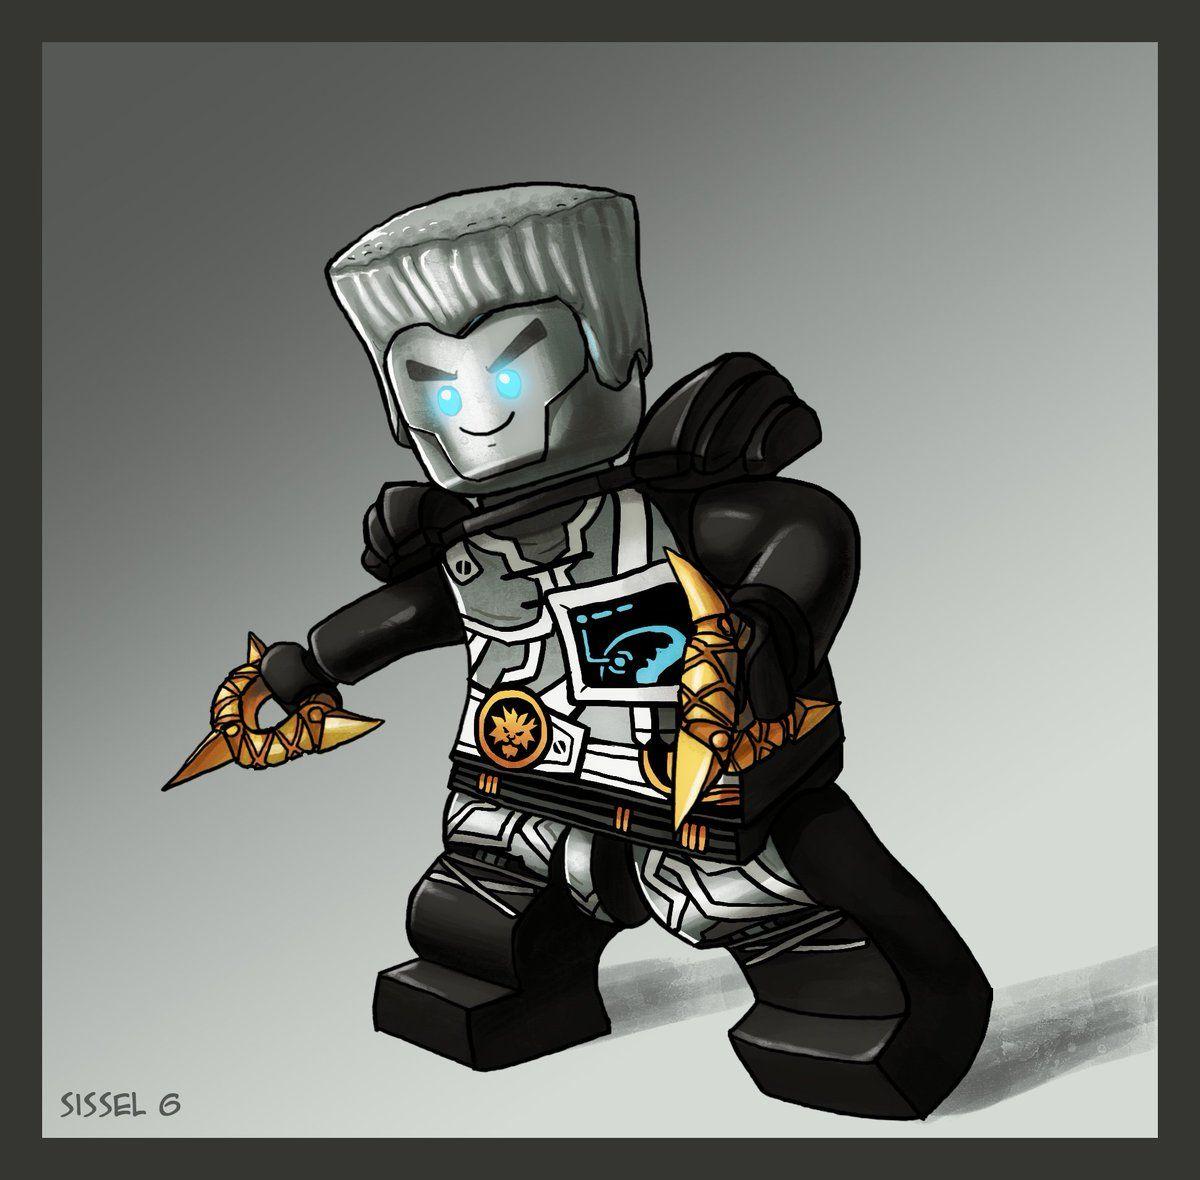 Sissel g sisselicious twitter lego ninjago - Ninjago lego zane ...